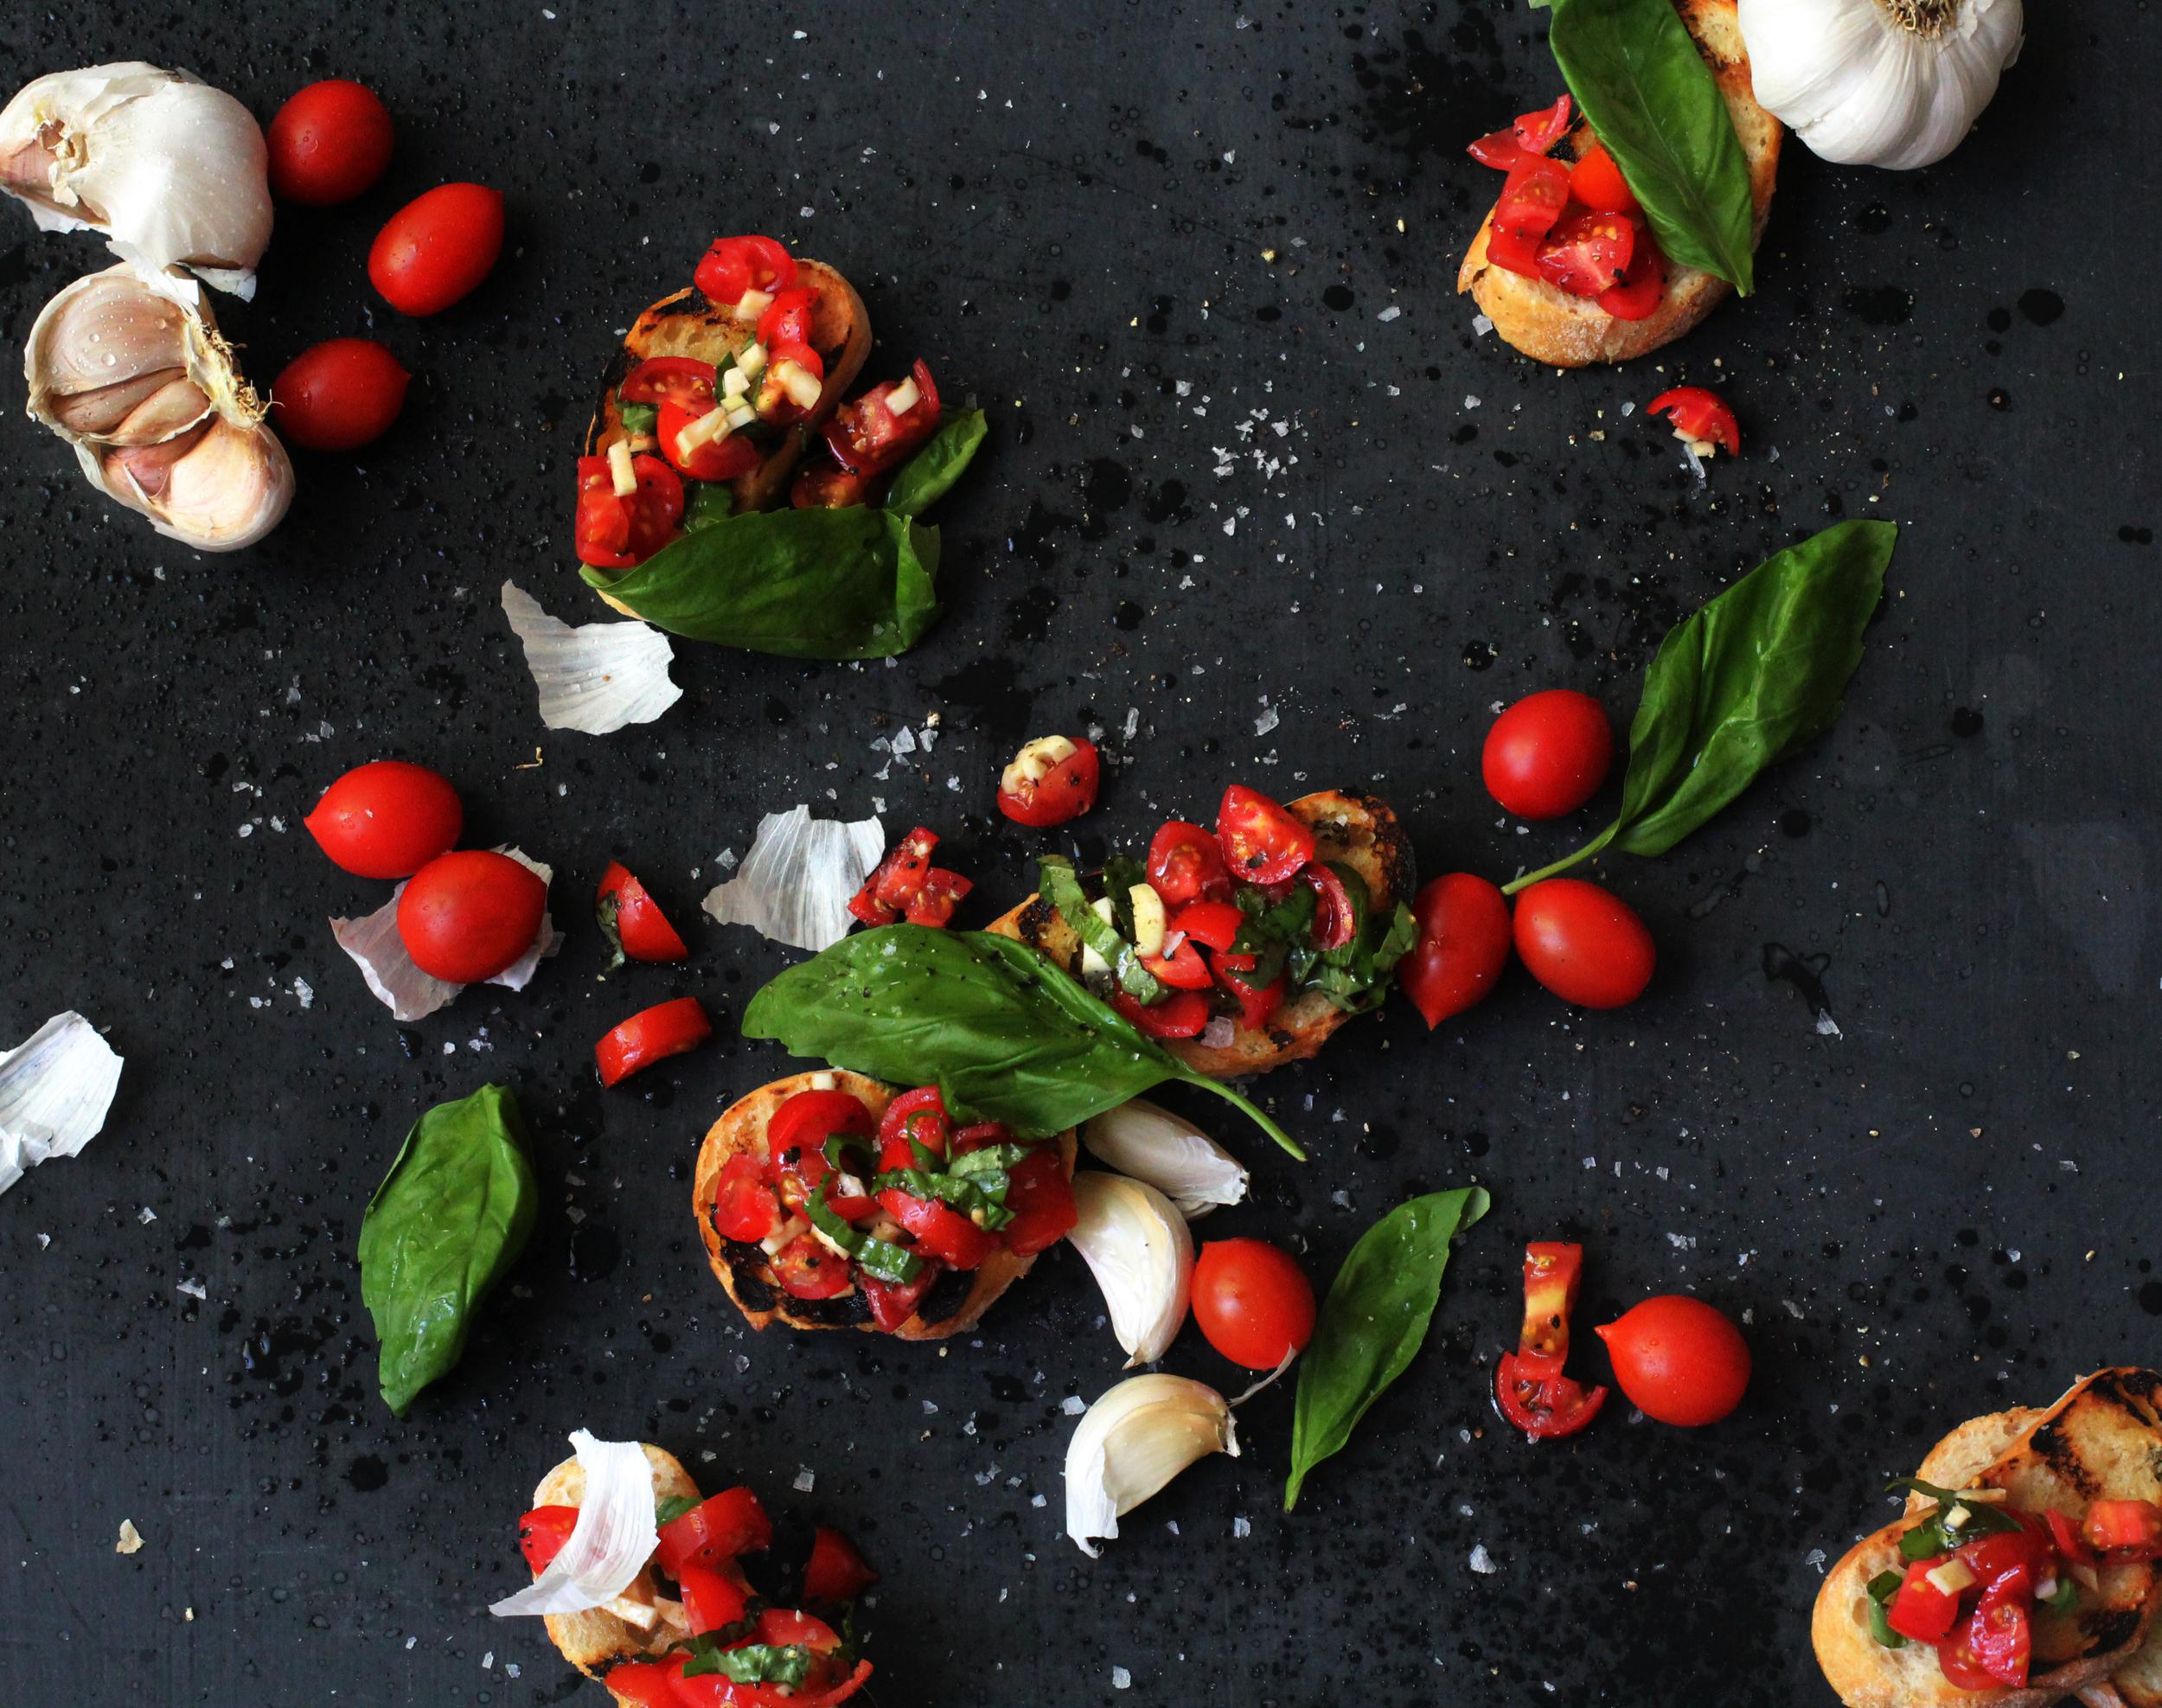 tomatobruschetta